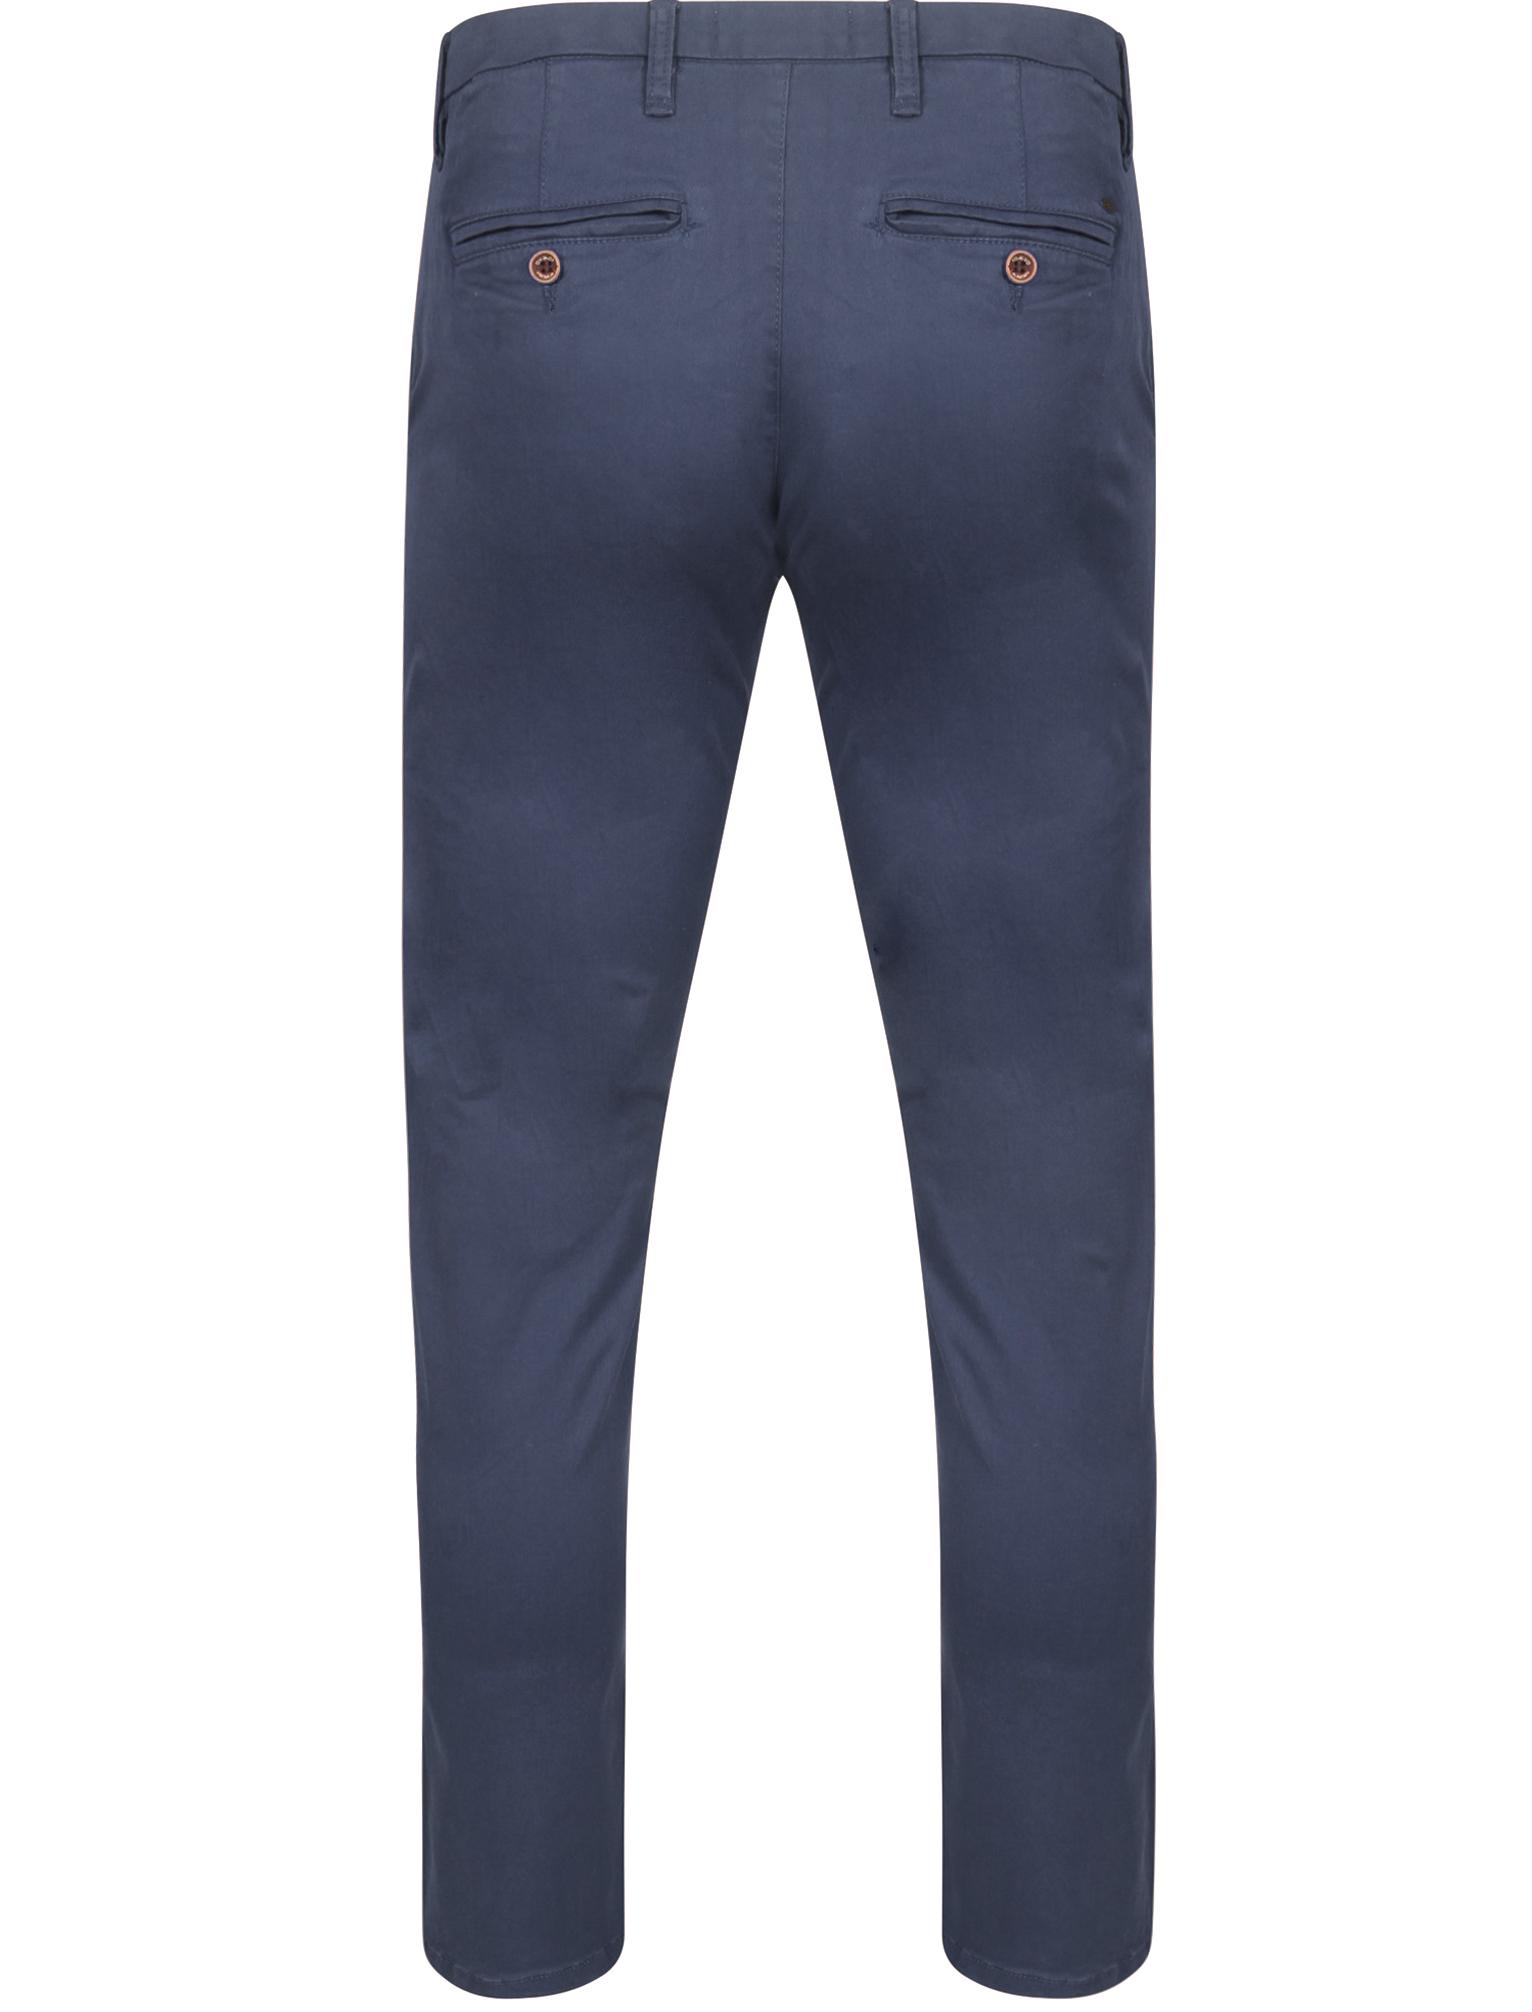 New Mens Tokyo Laundry Paros Regular Straight Leg Smart Twill Chinos Size 30-38